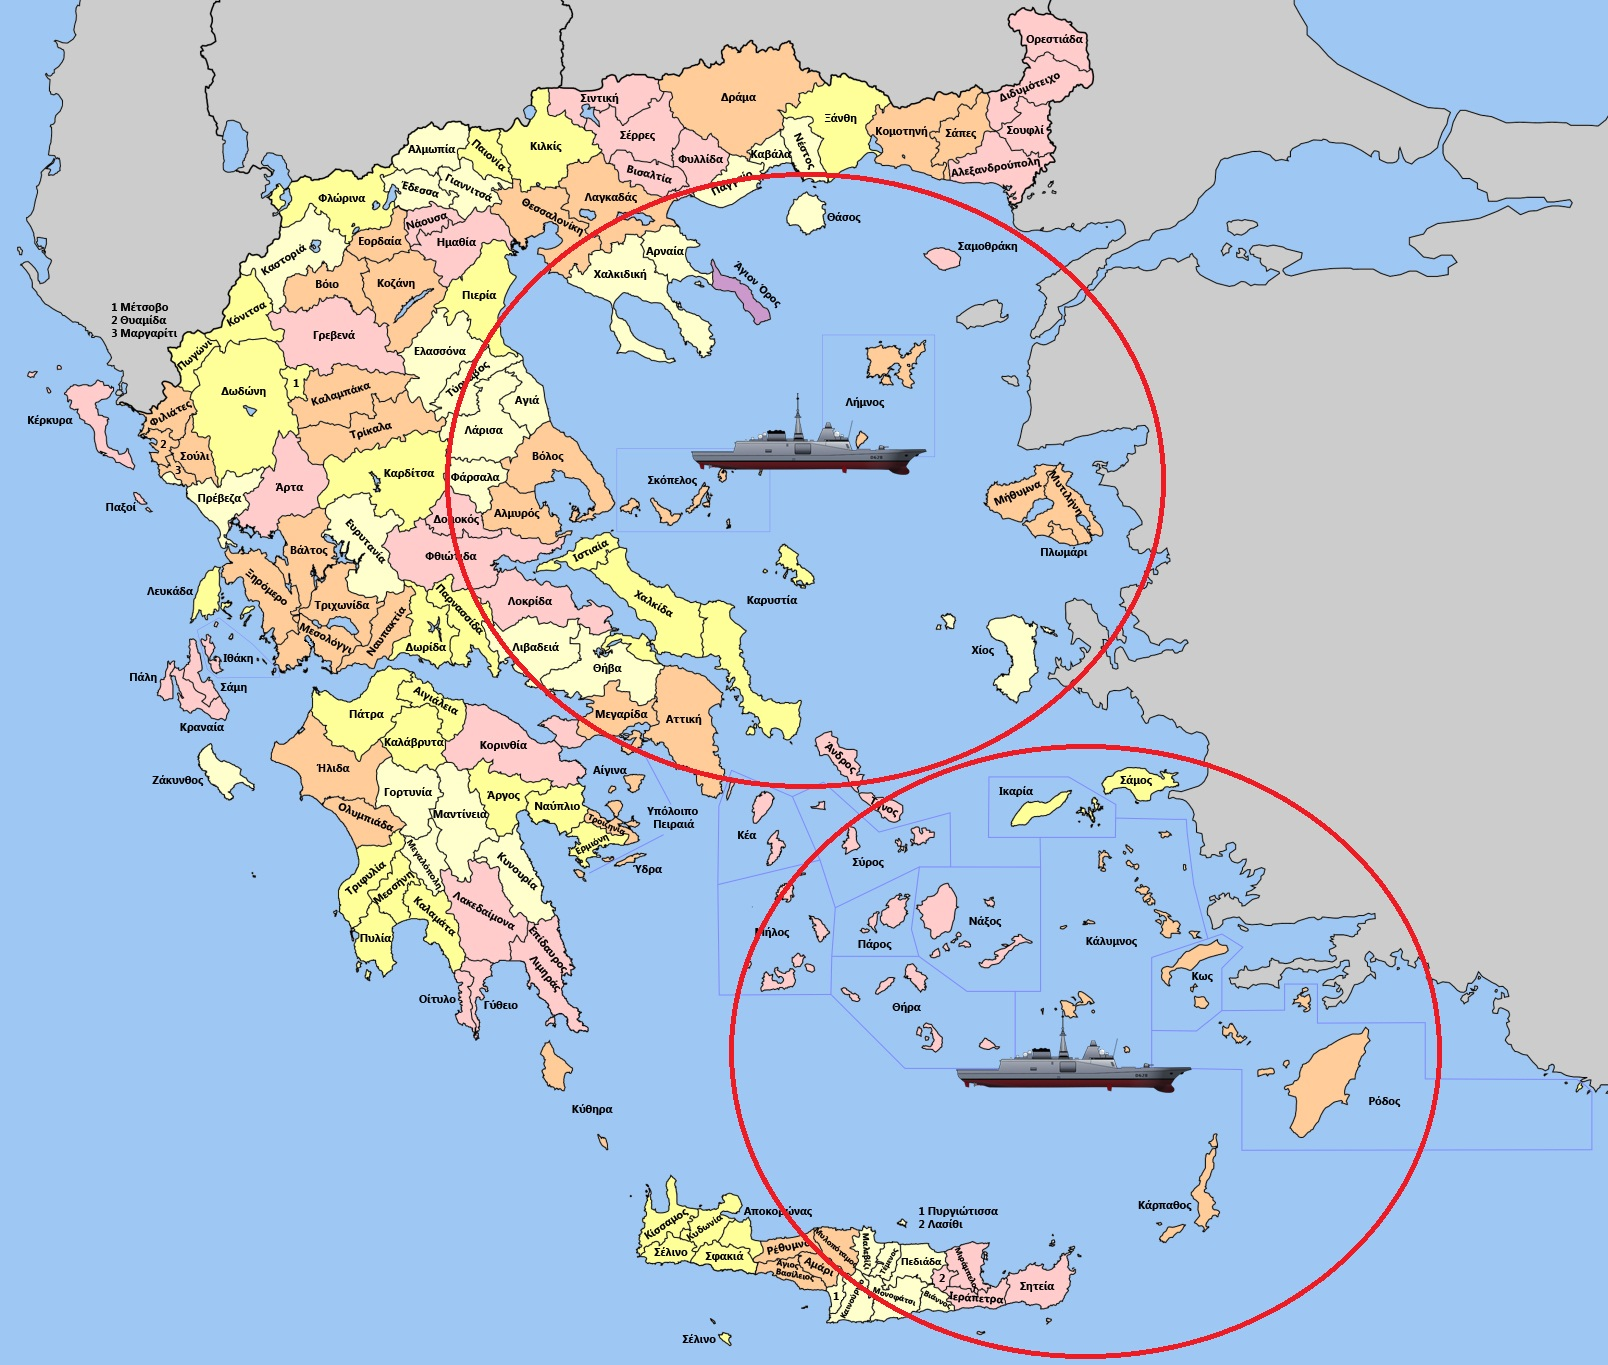 "O Πάνος Καμμένος ""κλειδώνει"" το Αιγαίο με δυο αντιαεροπορικές φρεγάτες FREMM/Πυραύλους Cruise-Στις 3 Μαϊου έρχονται οι Γάλλοι [ΒΙΝΤΕΟ]"